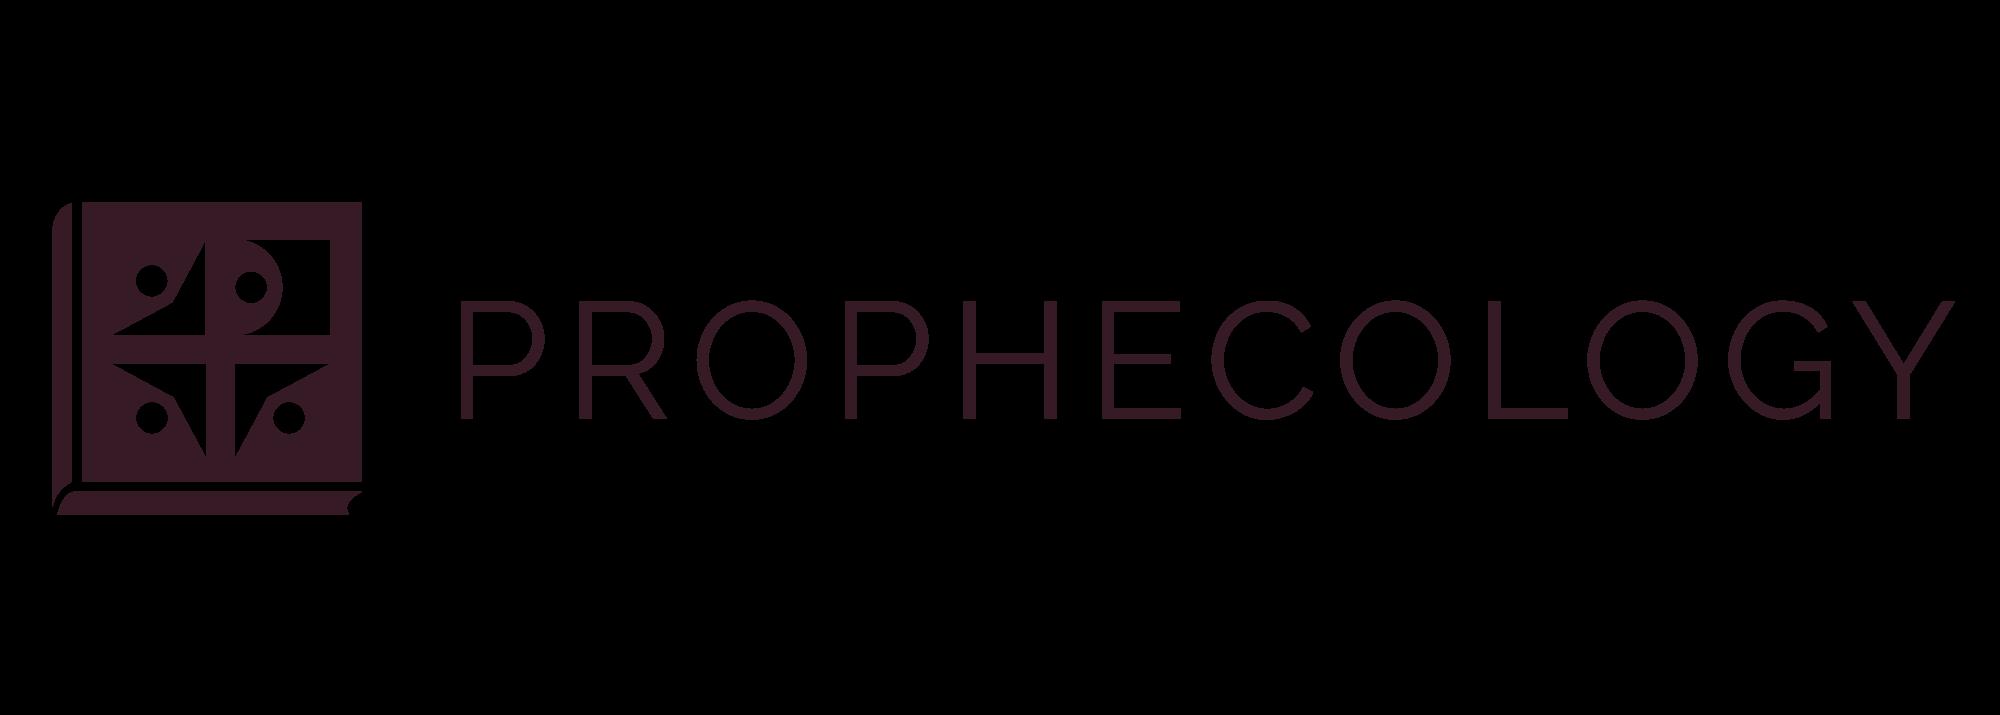 Prophecology-logo-H-maroon